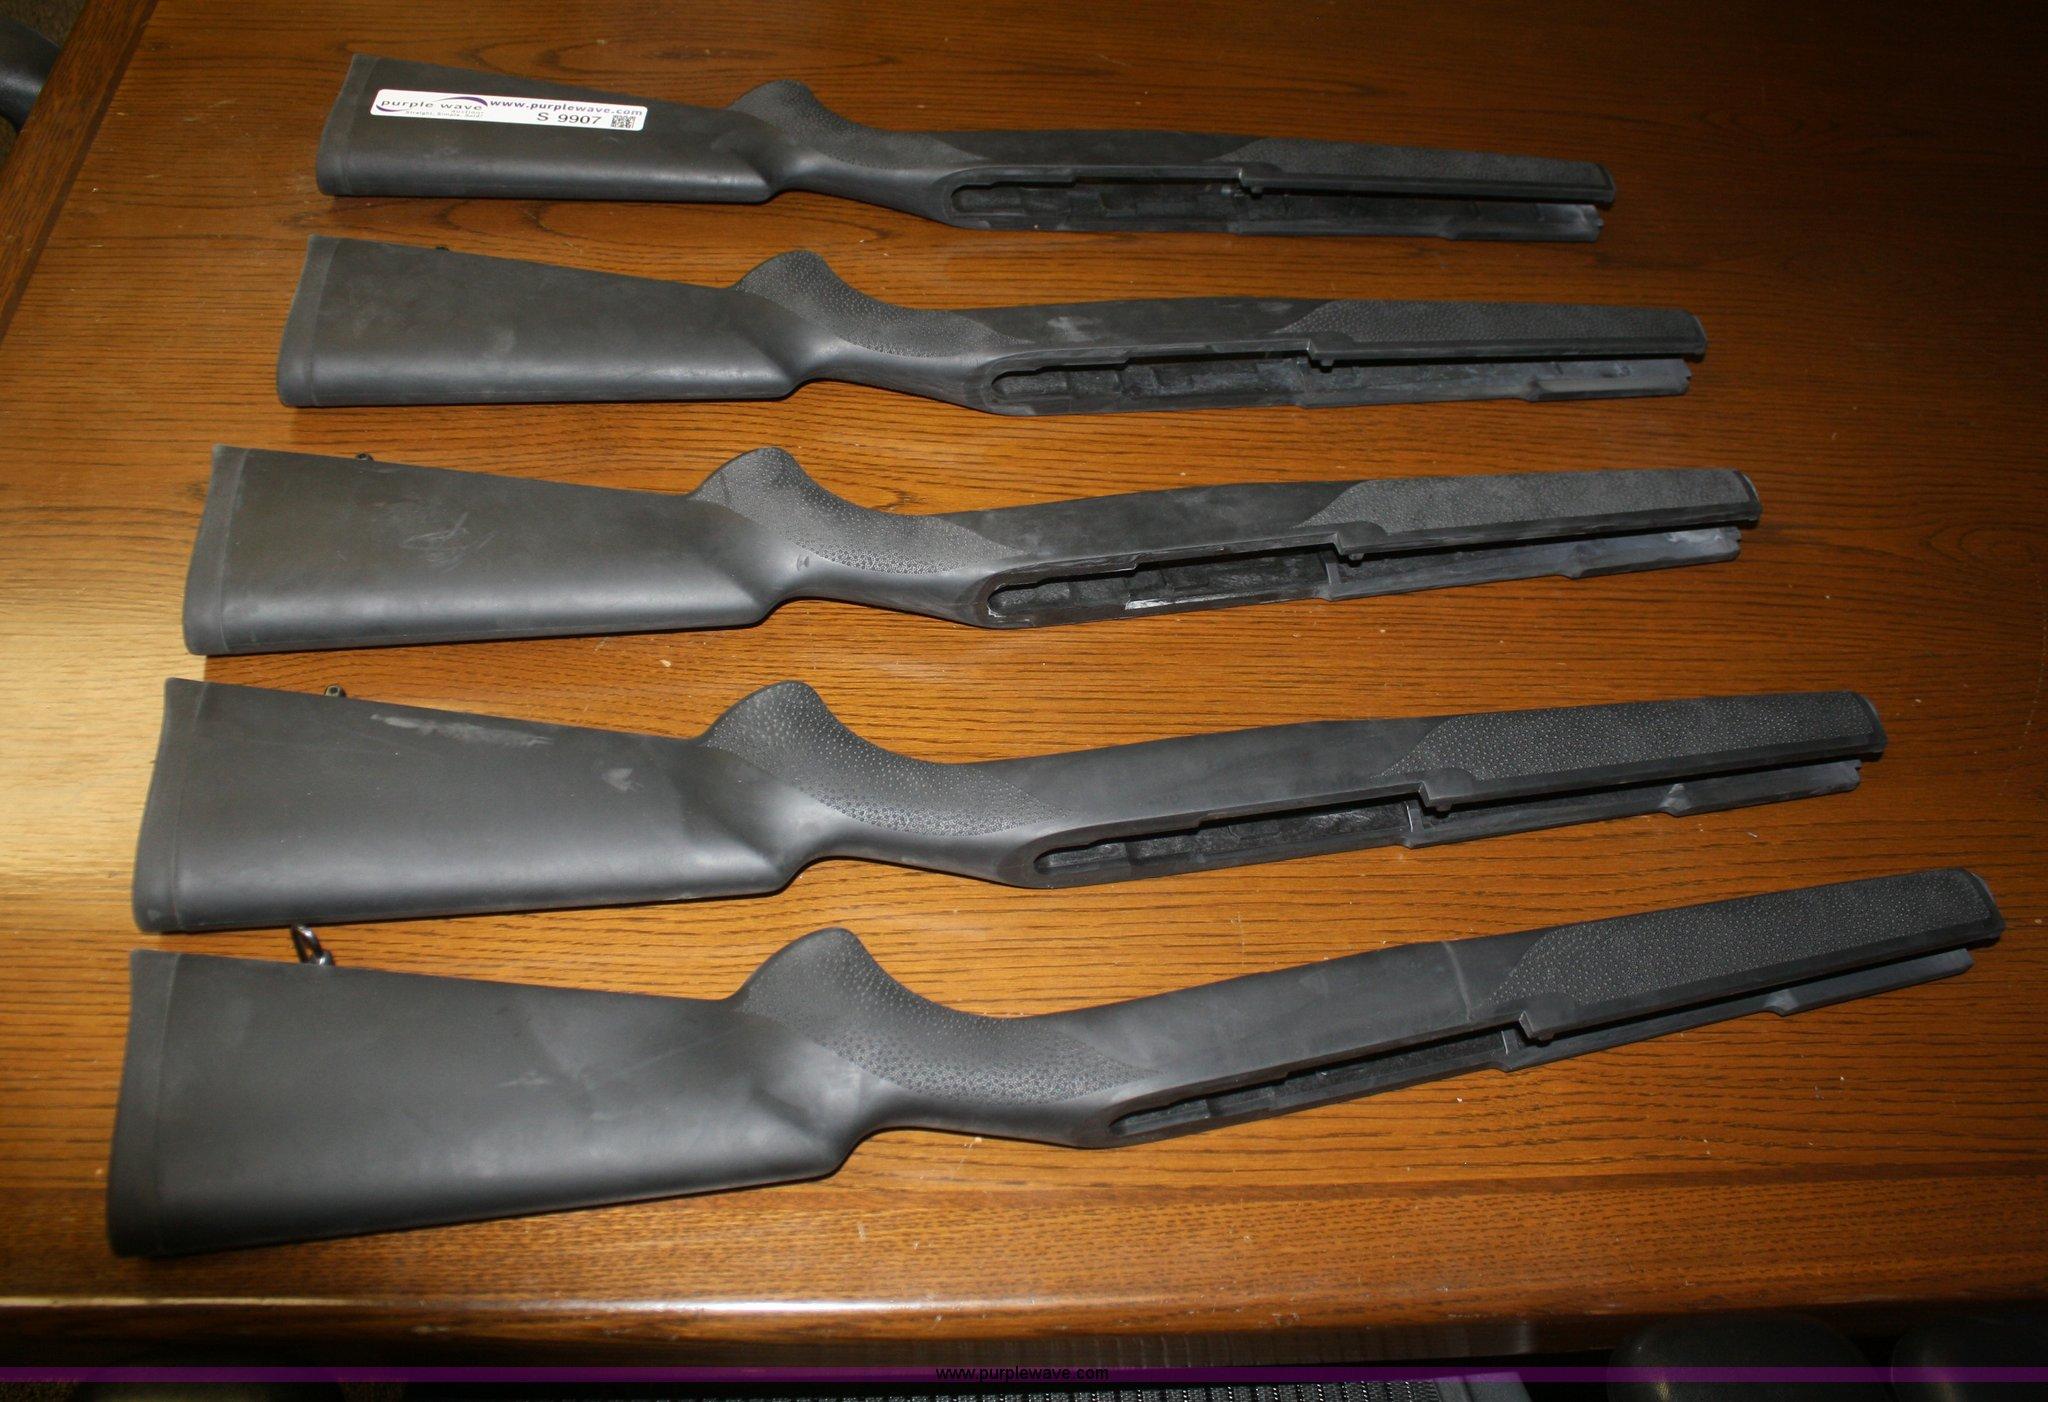 5) Hoge Ruger Mini-14 rifle stocks | Item S9907 | SOLD! Mar